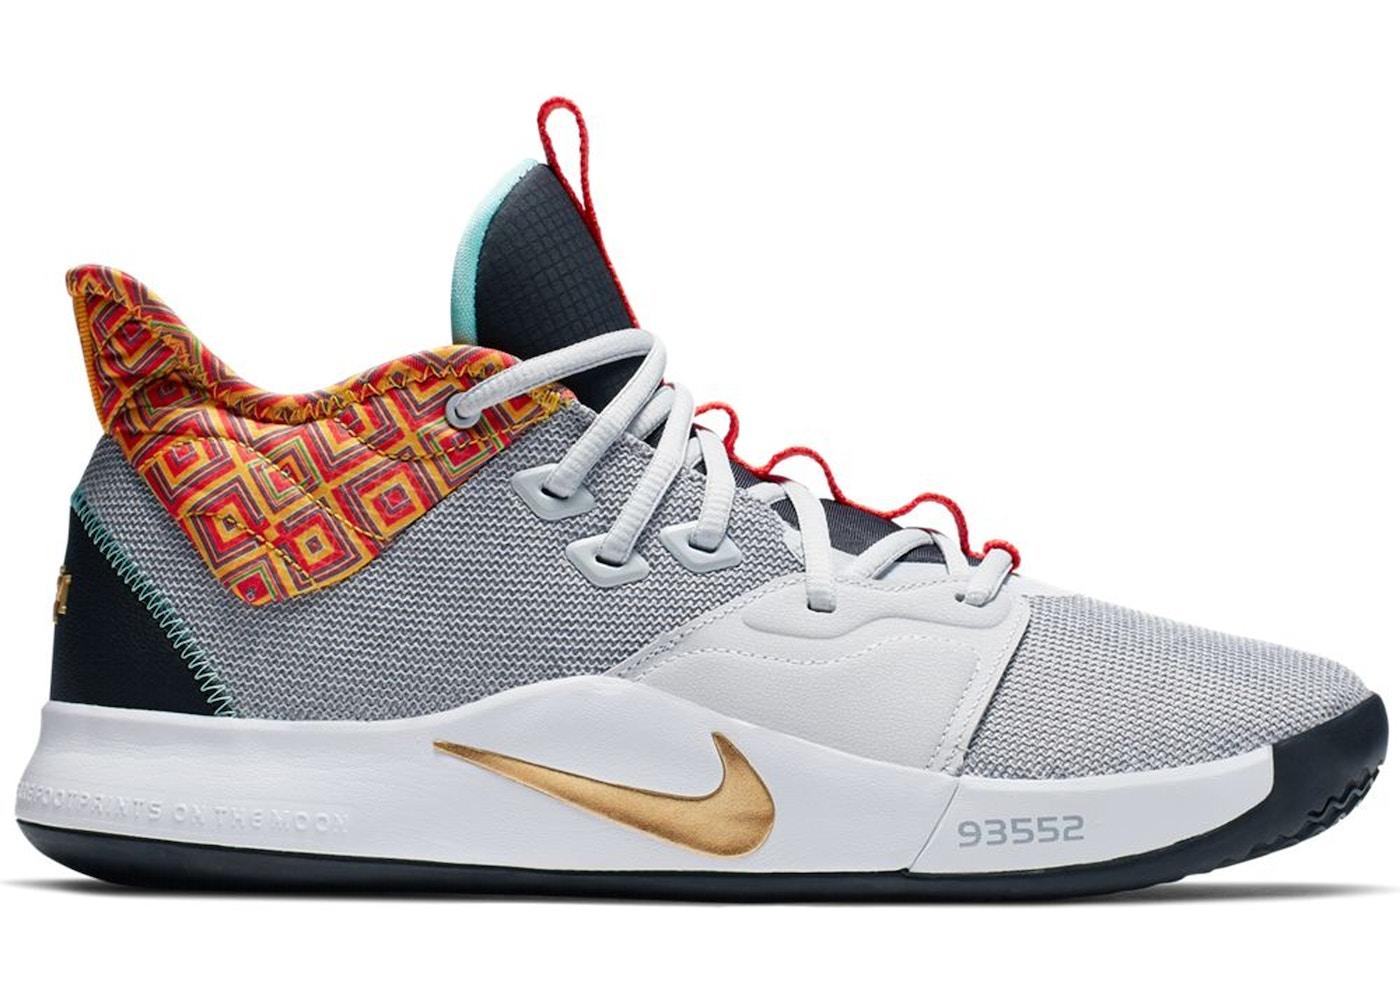 da537d8b0783 Nike PG 3 BHM (2019) - BQ6242-007